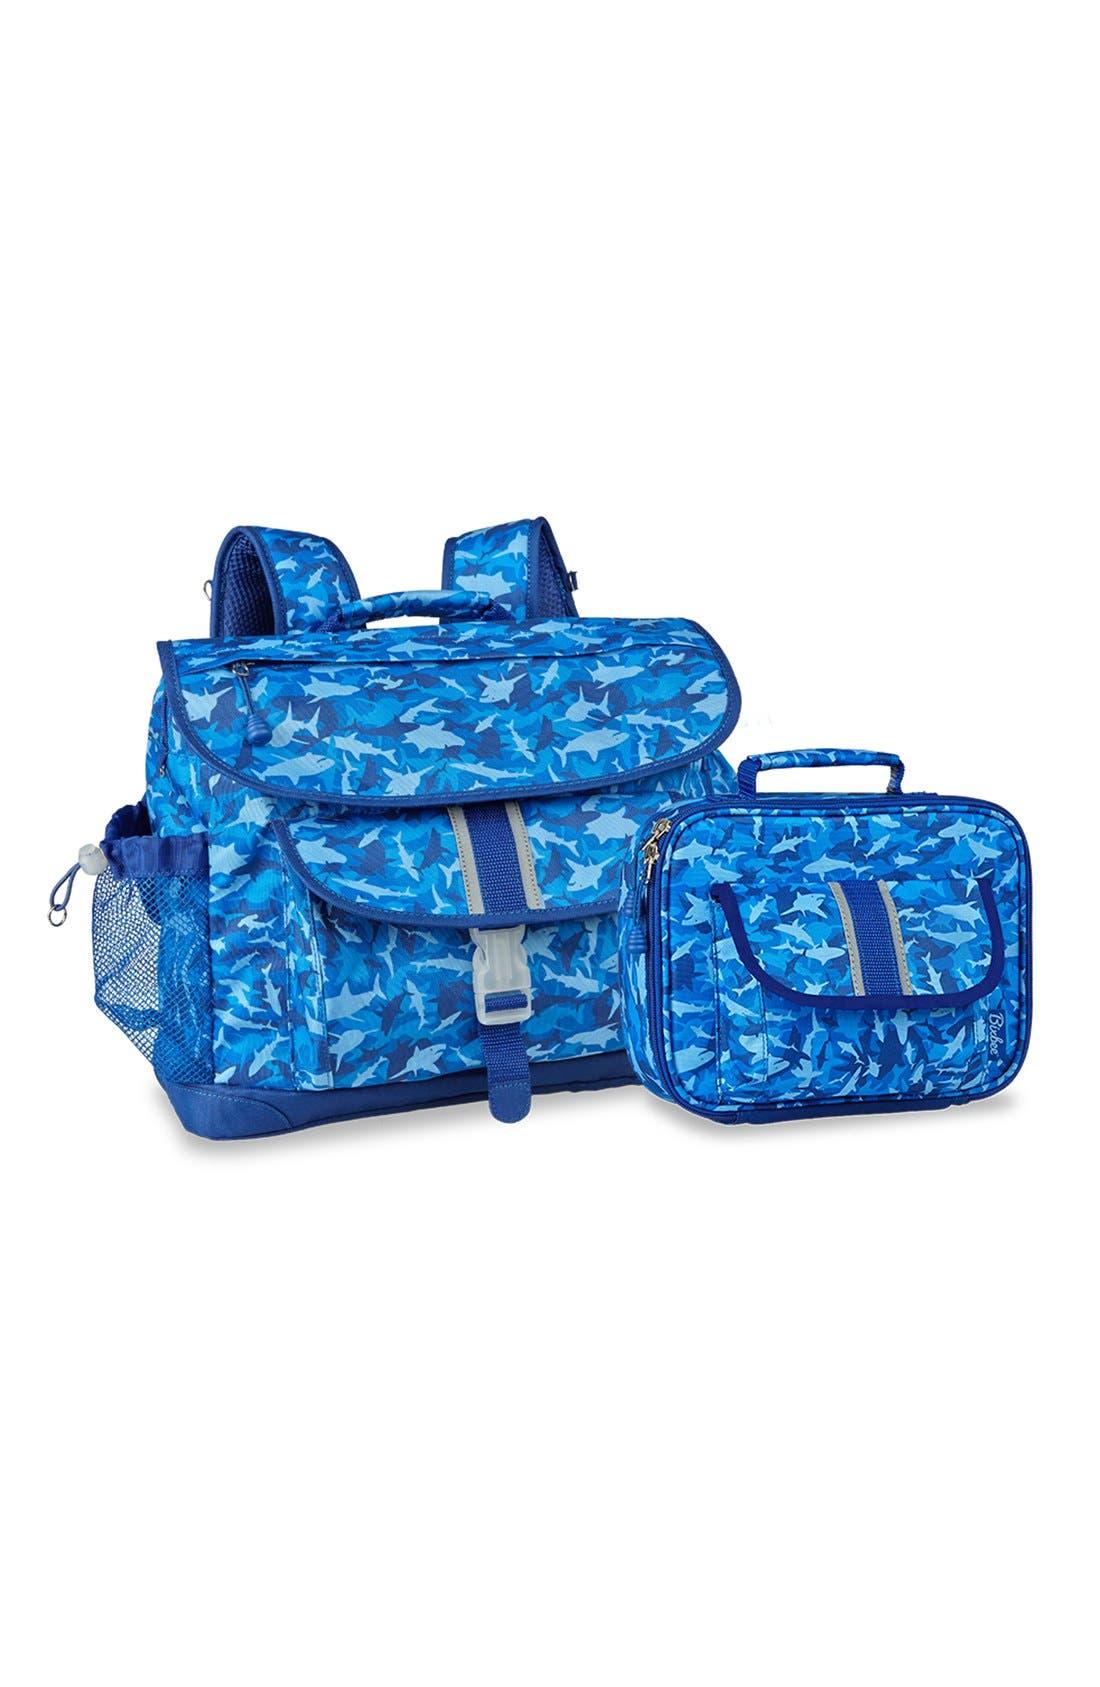 BIXBEE Large Shark Camo Water Resistant Backpack & Lunchbox